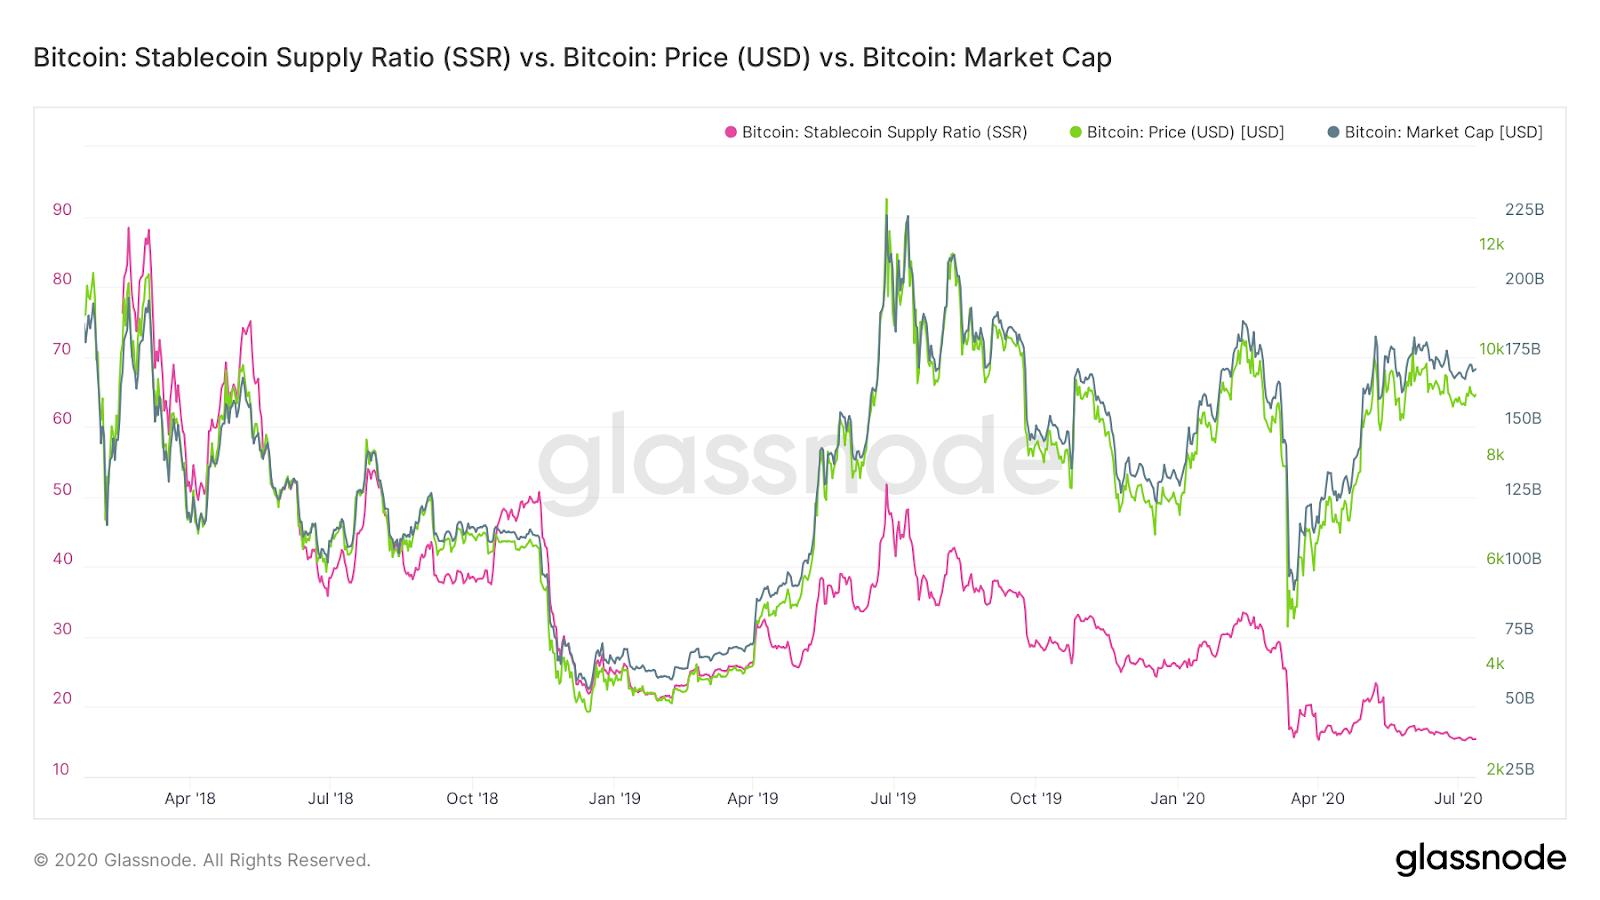 SSR, Bitcoin price and market capitalization